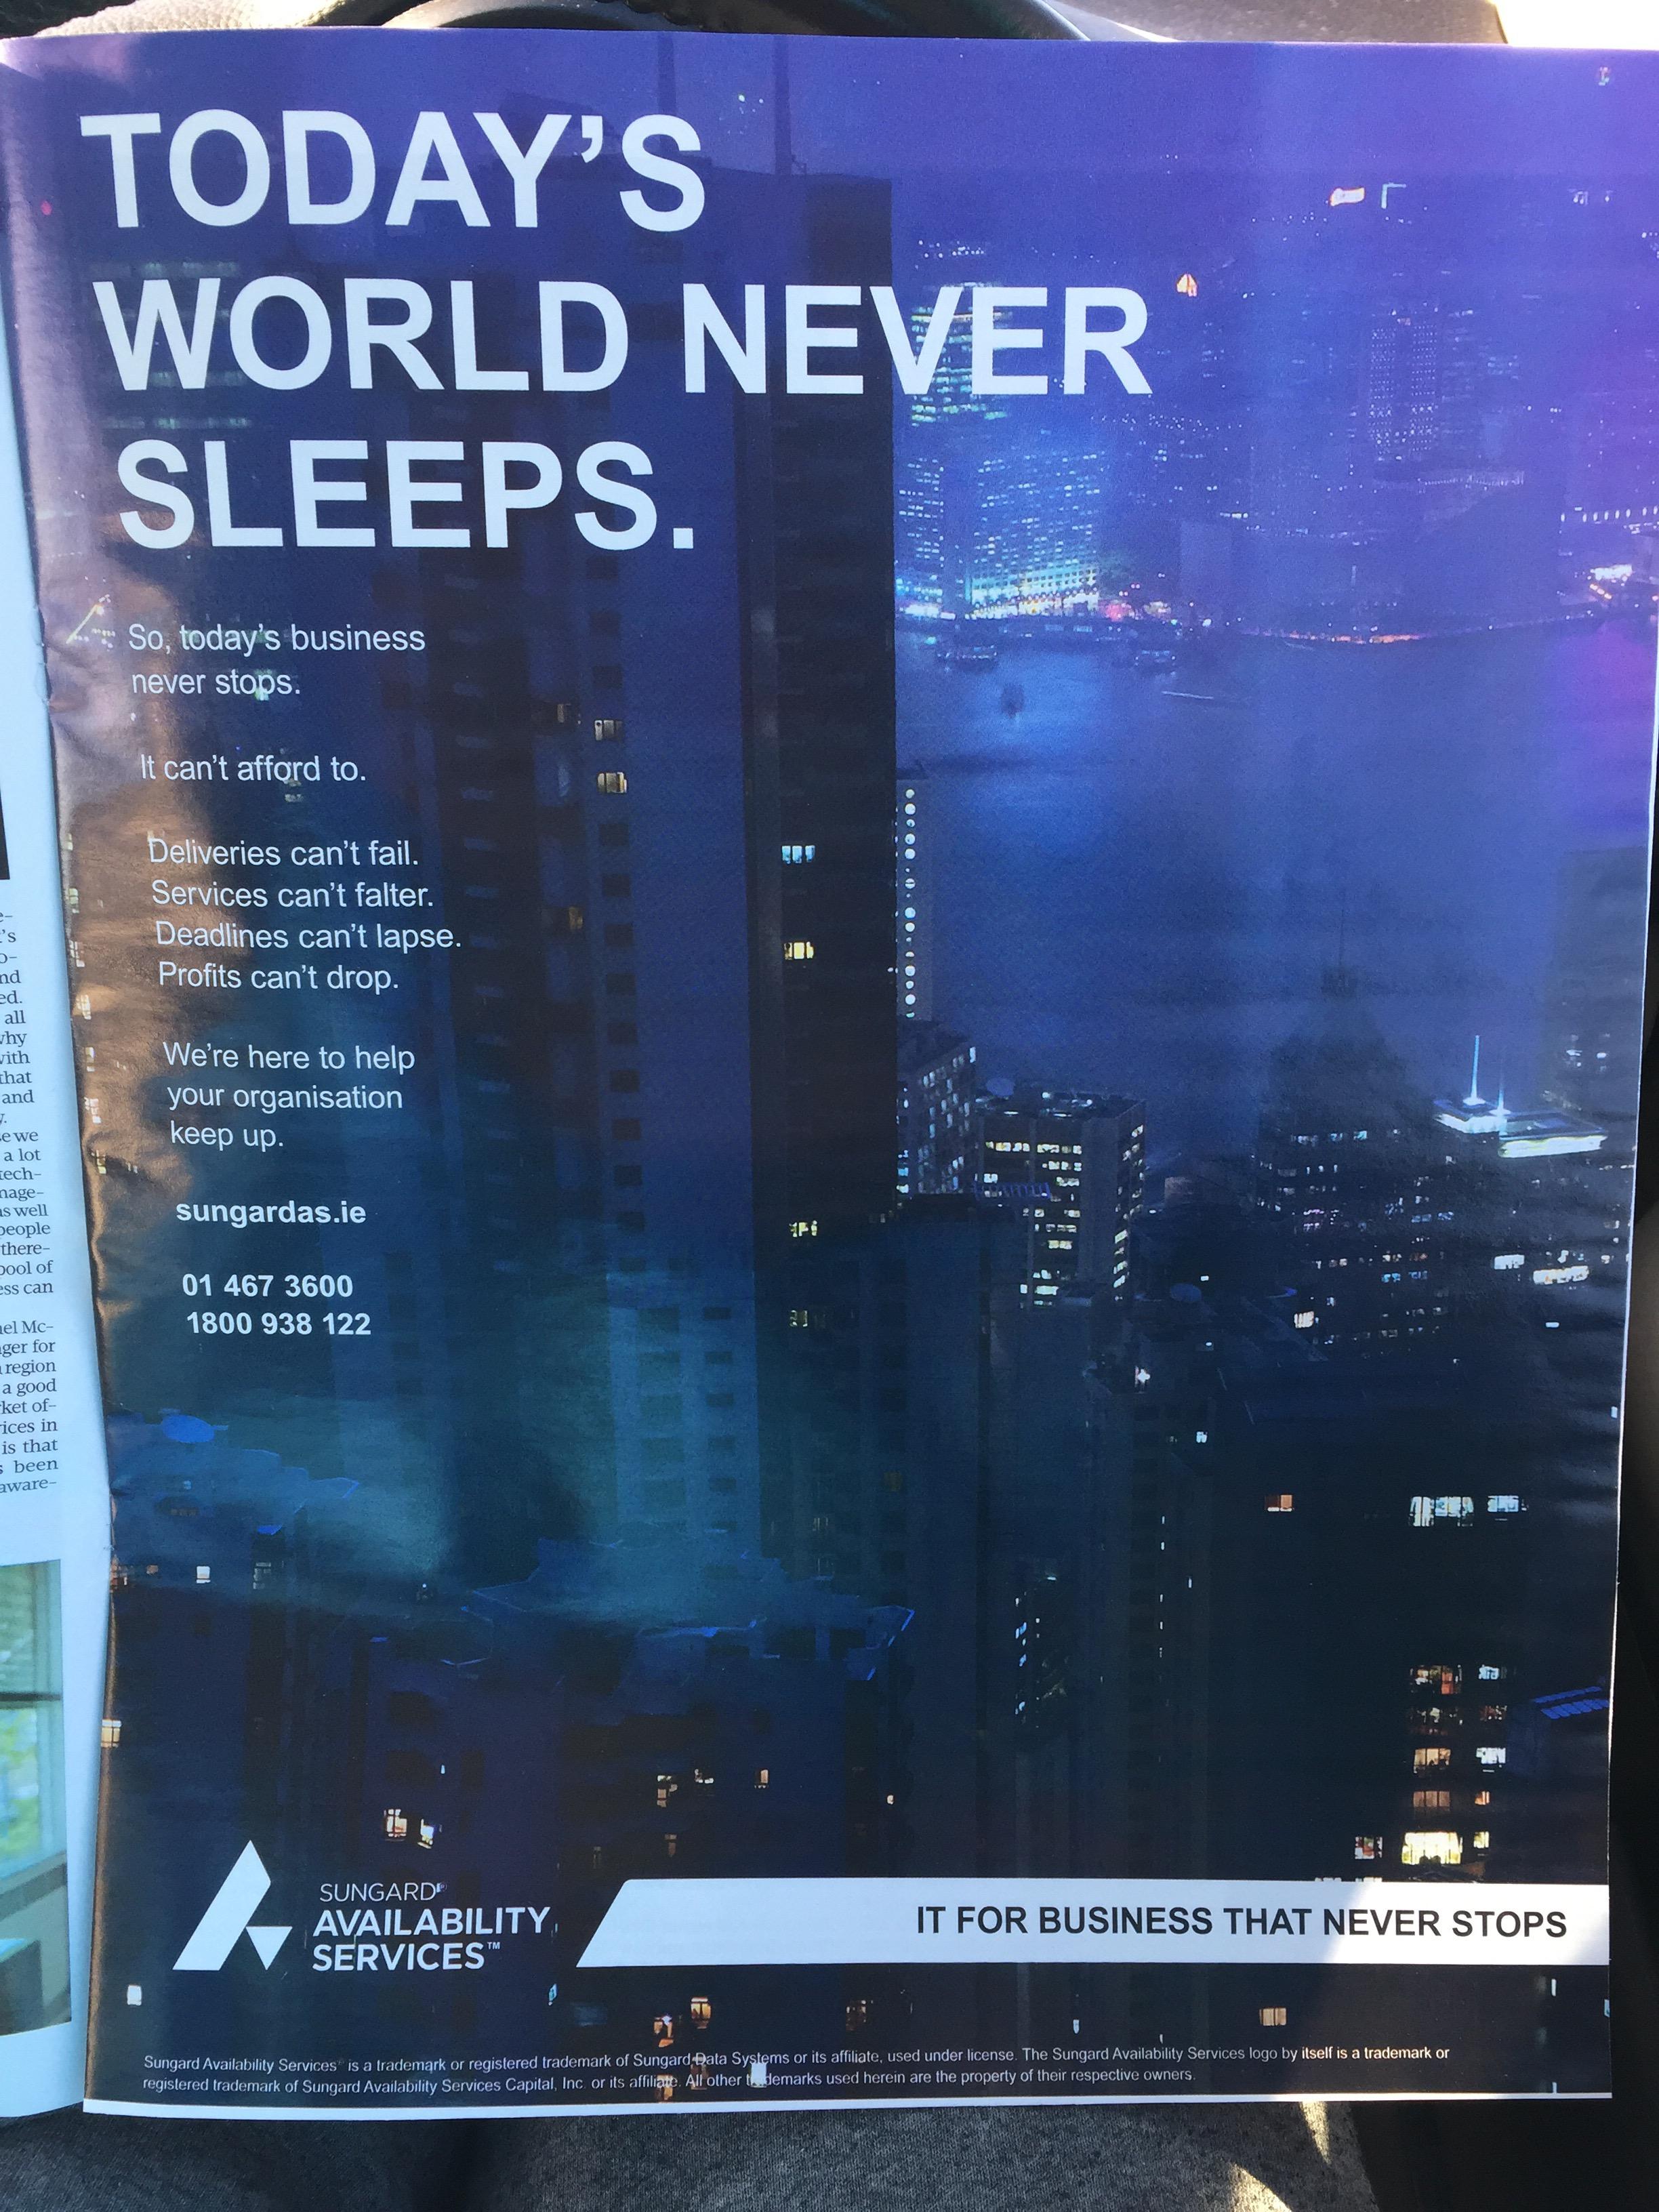 Sungard Availability Services – Today's world never sleeps